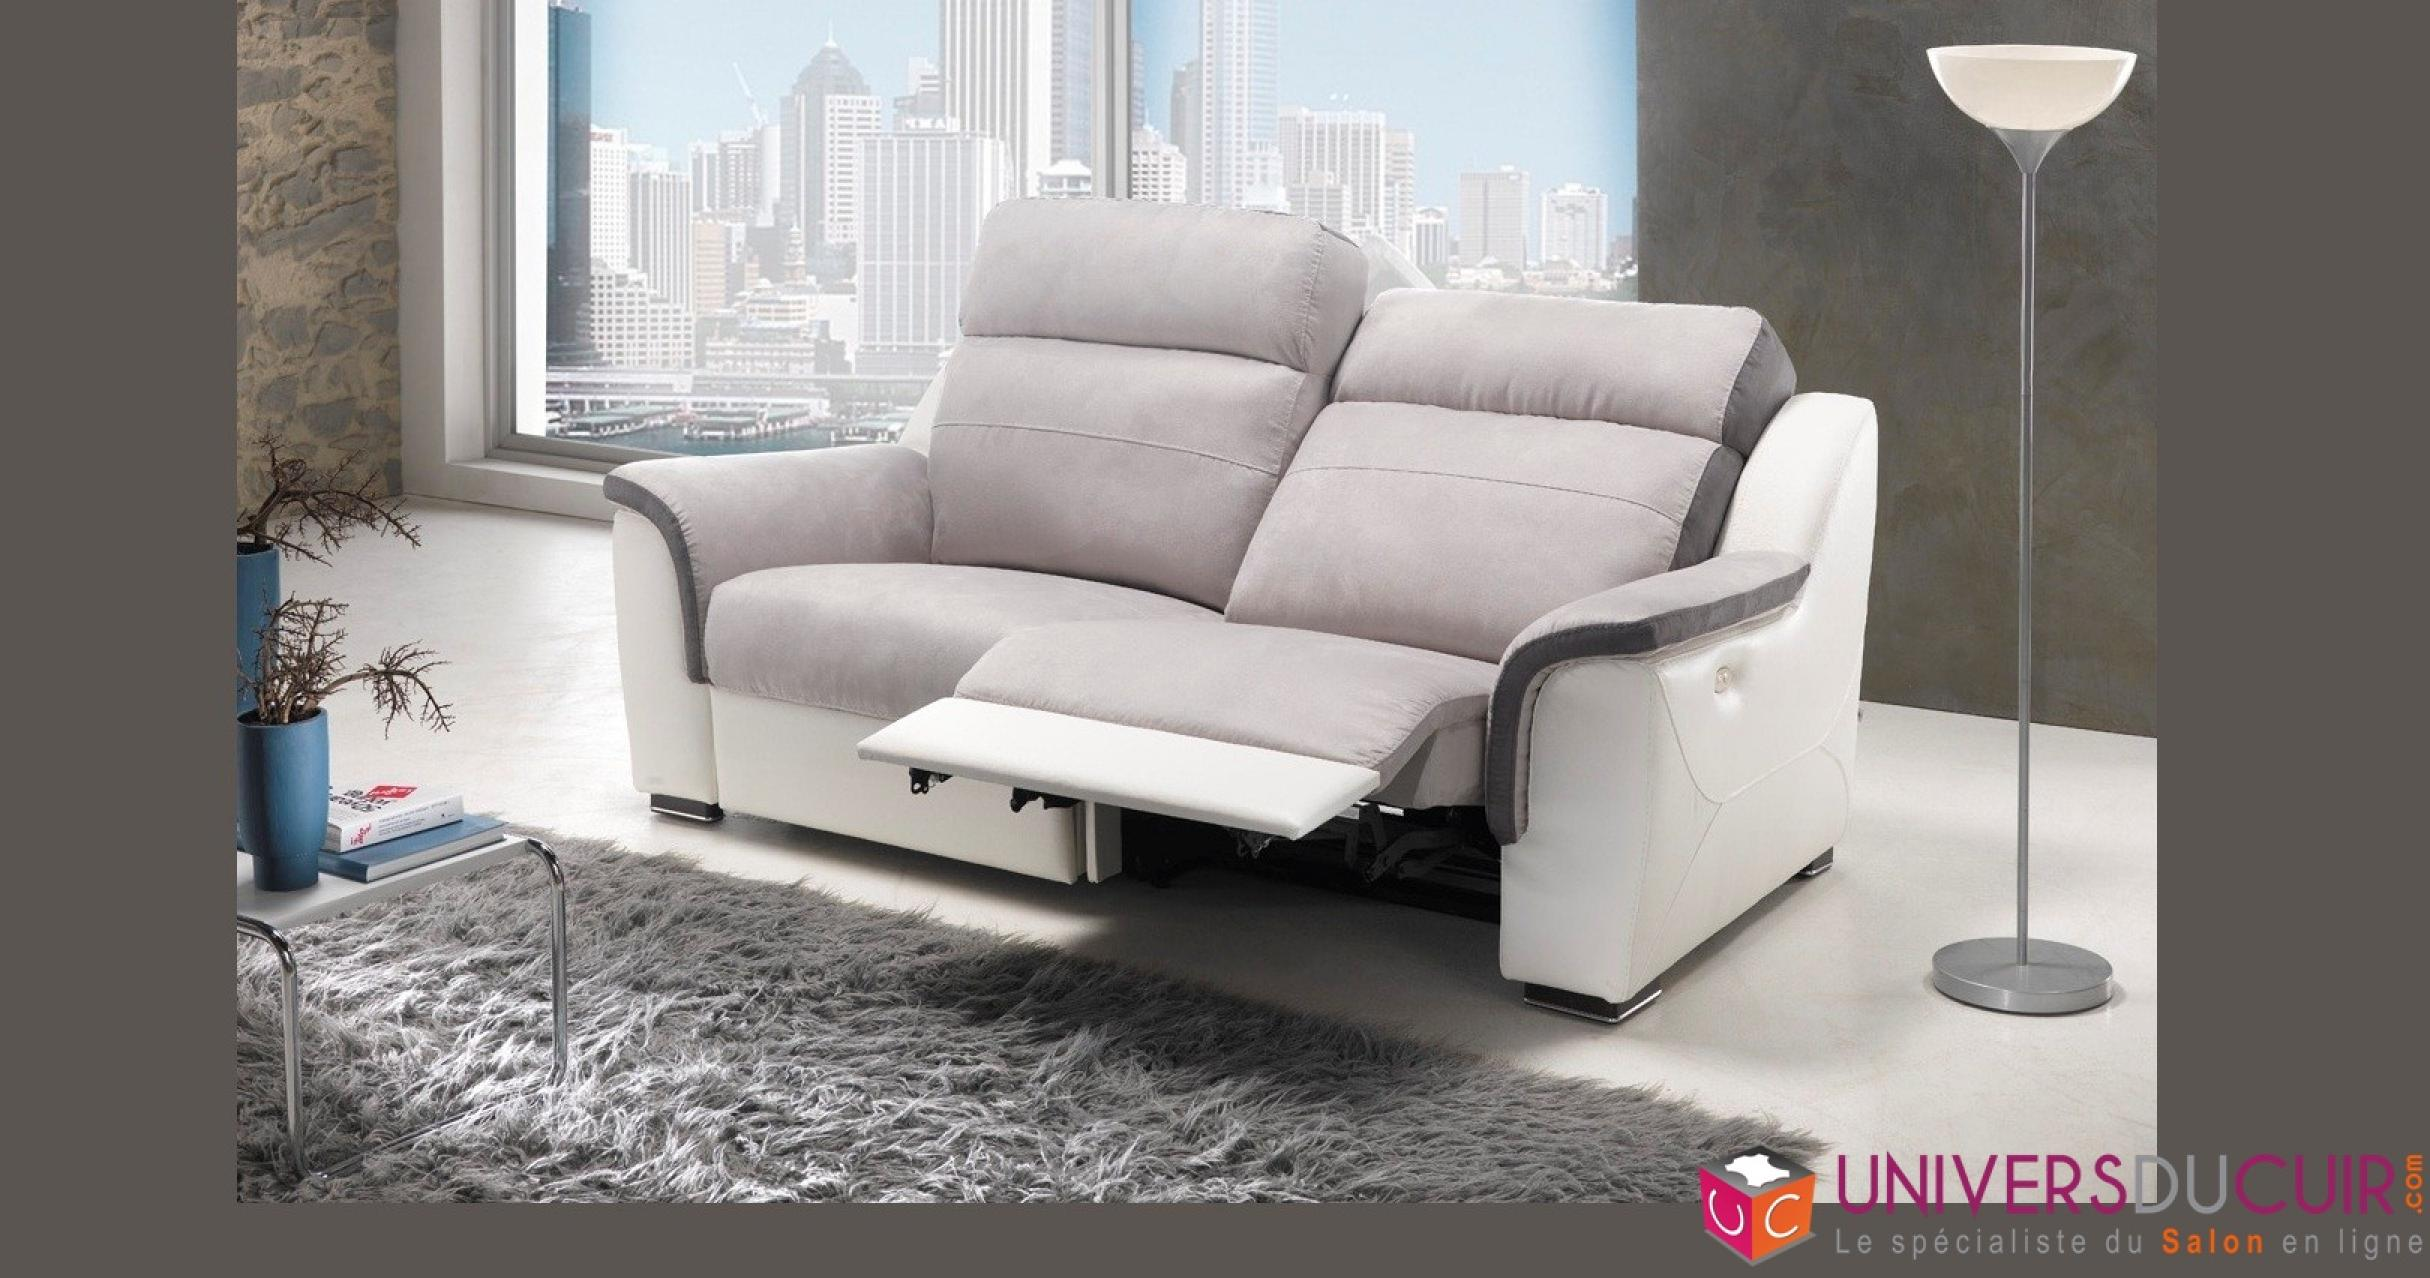 photos canap 2 places relax microfibre. Black Bedroom Furniture Sets. Home Design Ideas